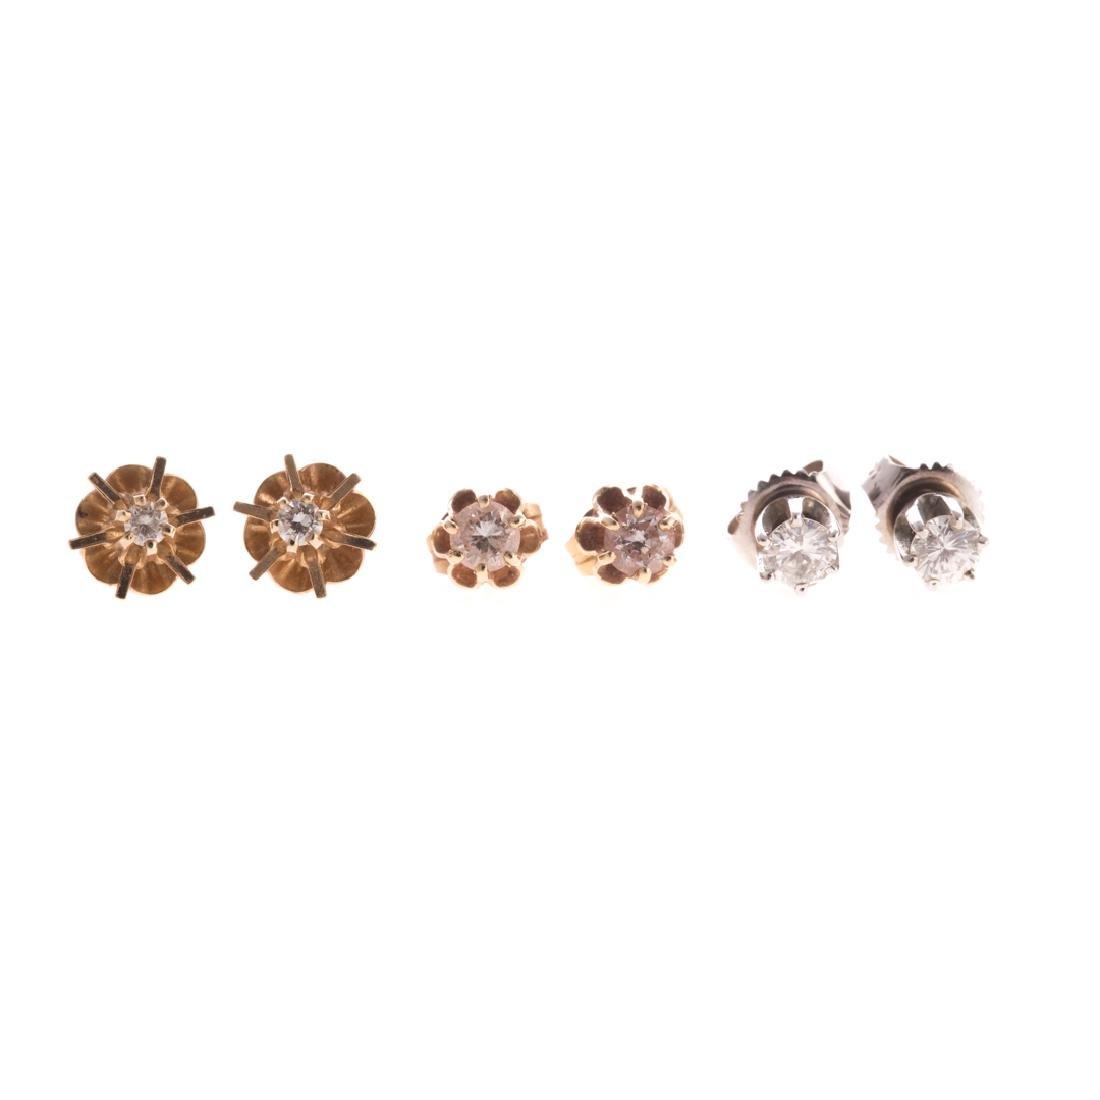 Three Pair of Diamond Ear Studs in 14K Gold